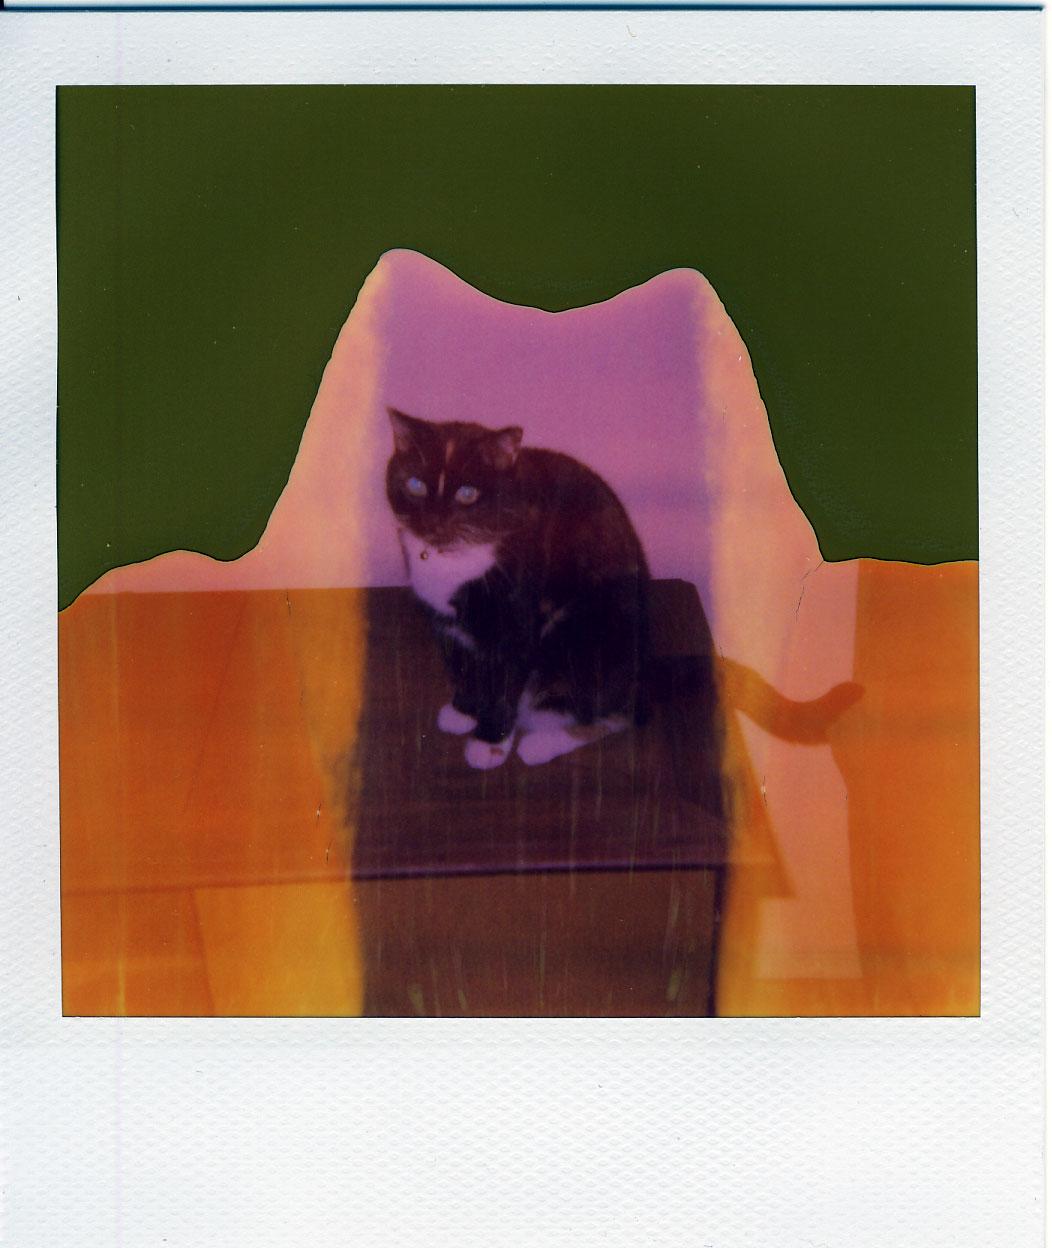 Number 6, Tortoiseshell Cat